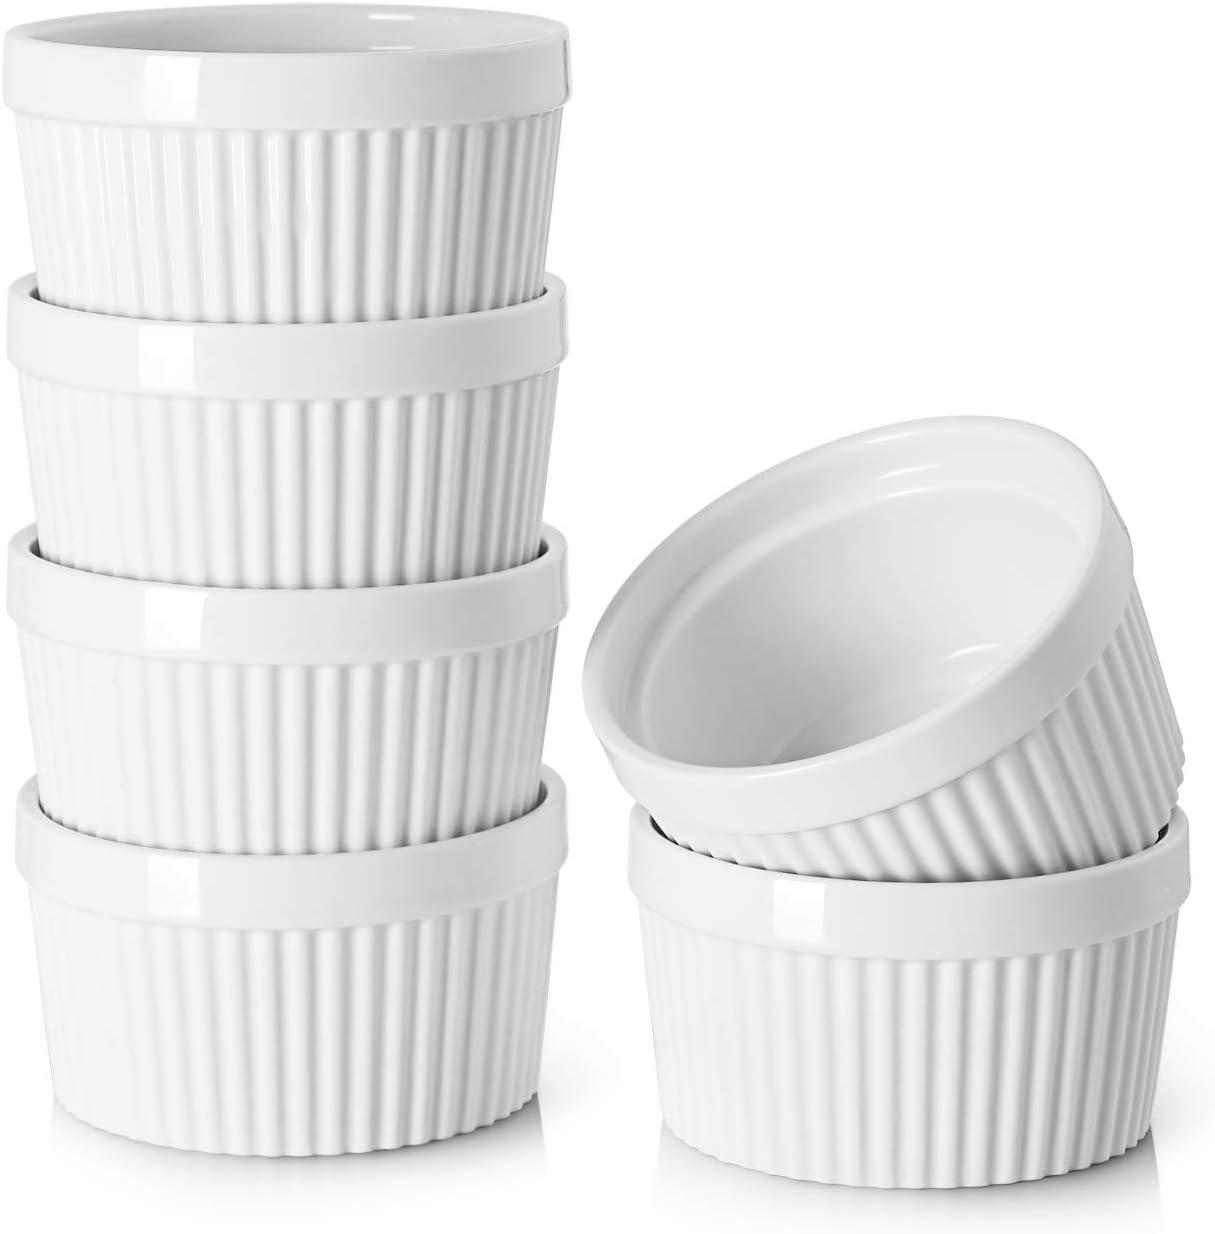 Dowan - 236ml Ramequines de porcelana para soufflé, crema Brulee, estilo clásico para hornear, juego de 6